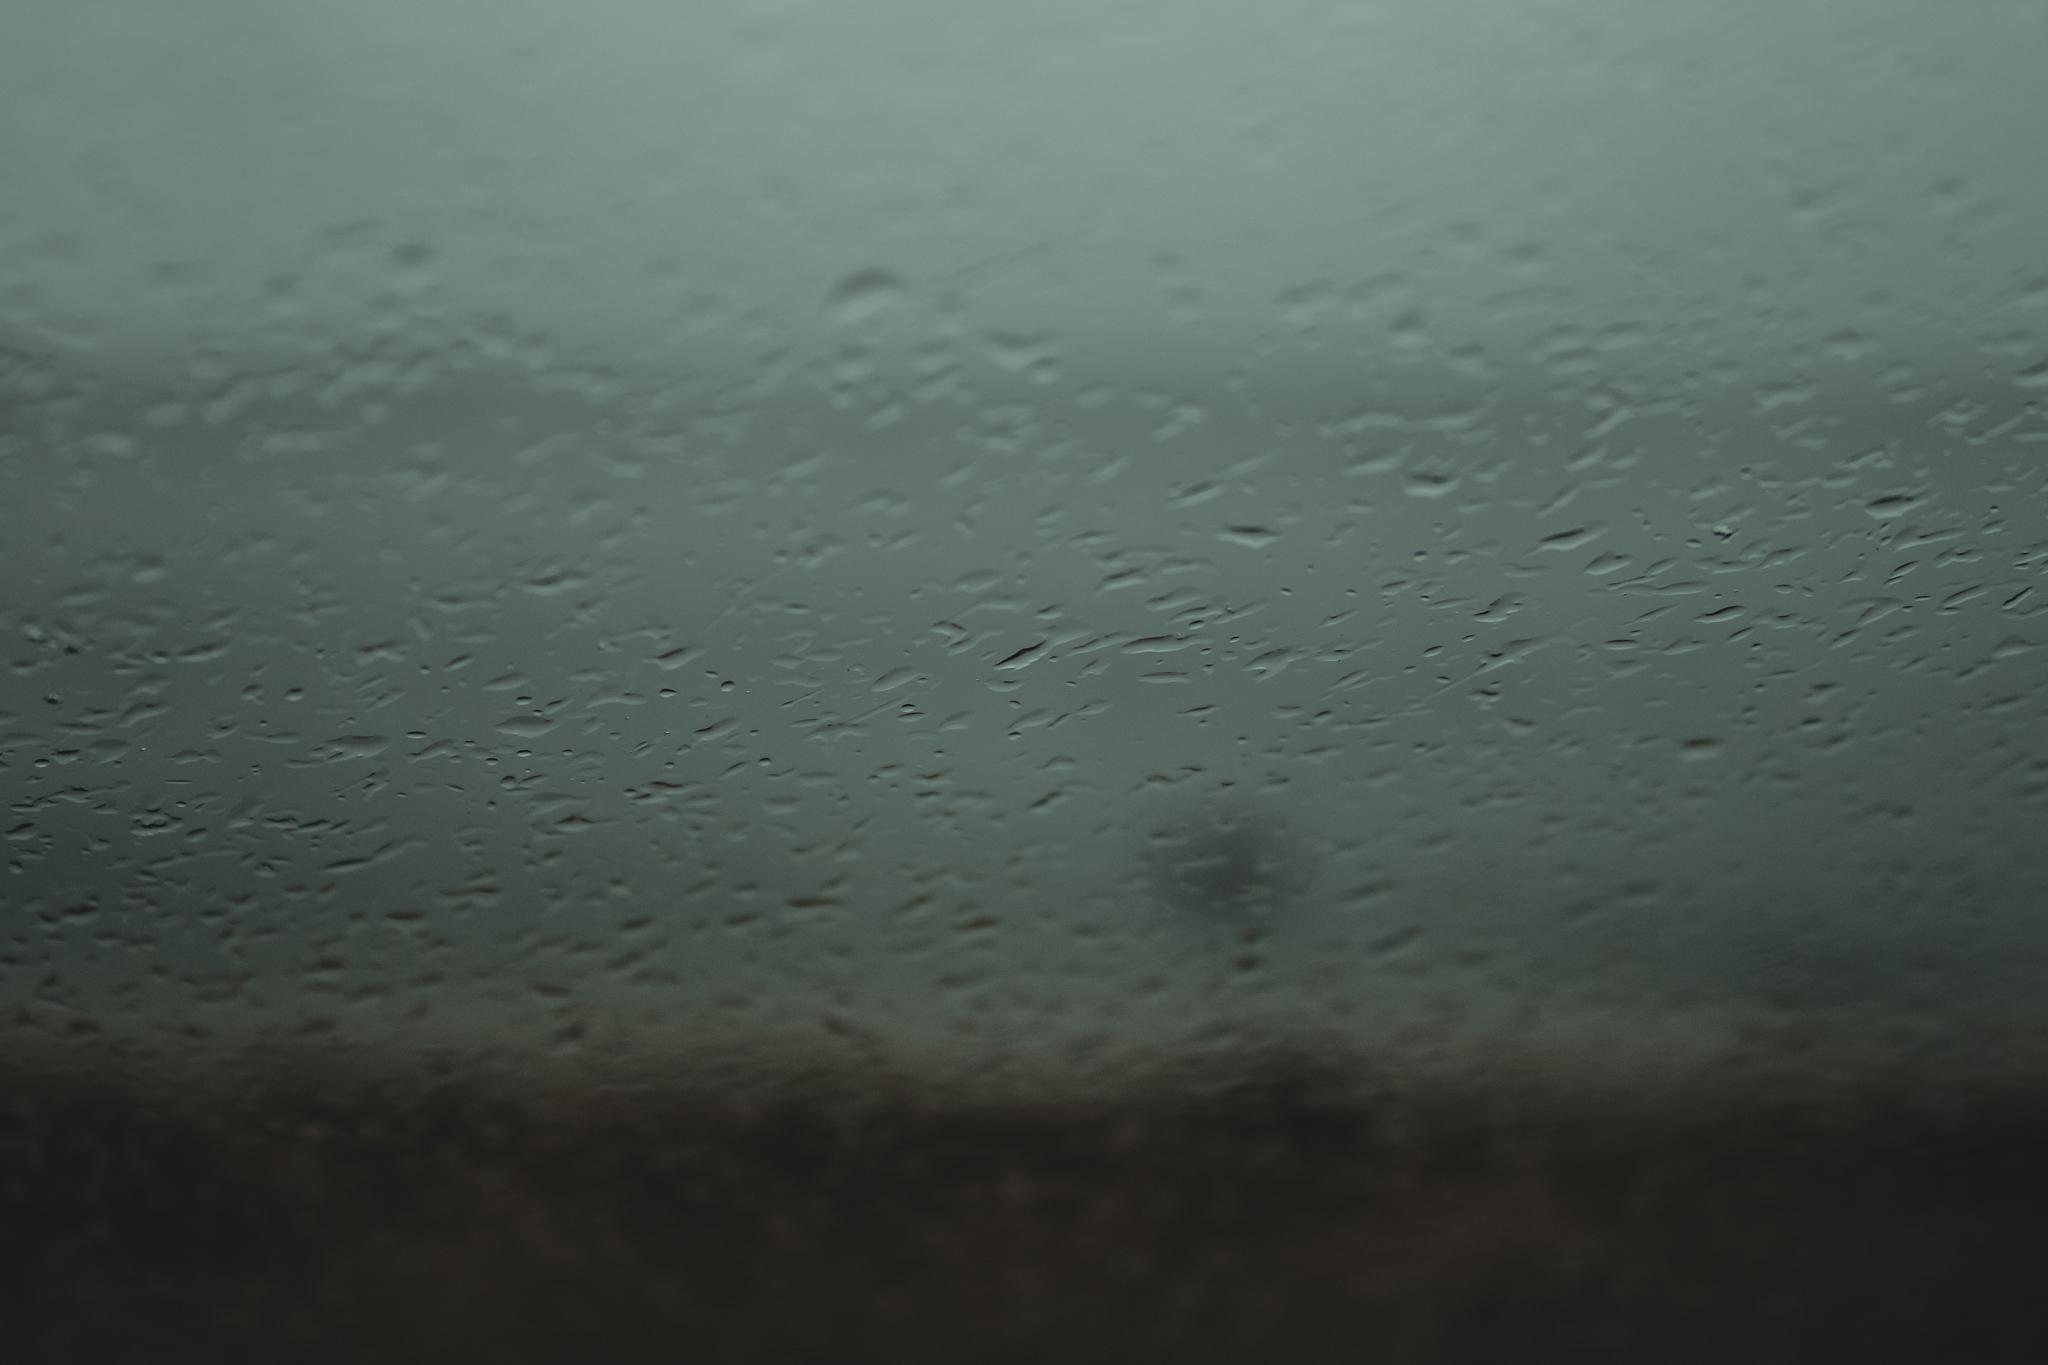 august 17. morning rain